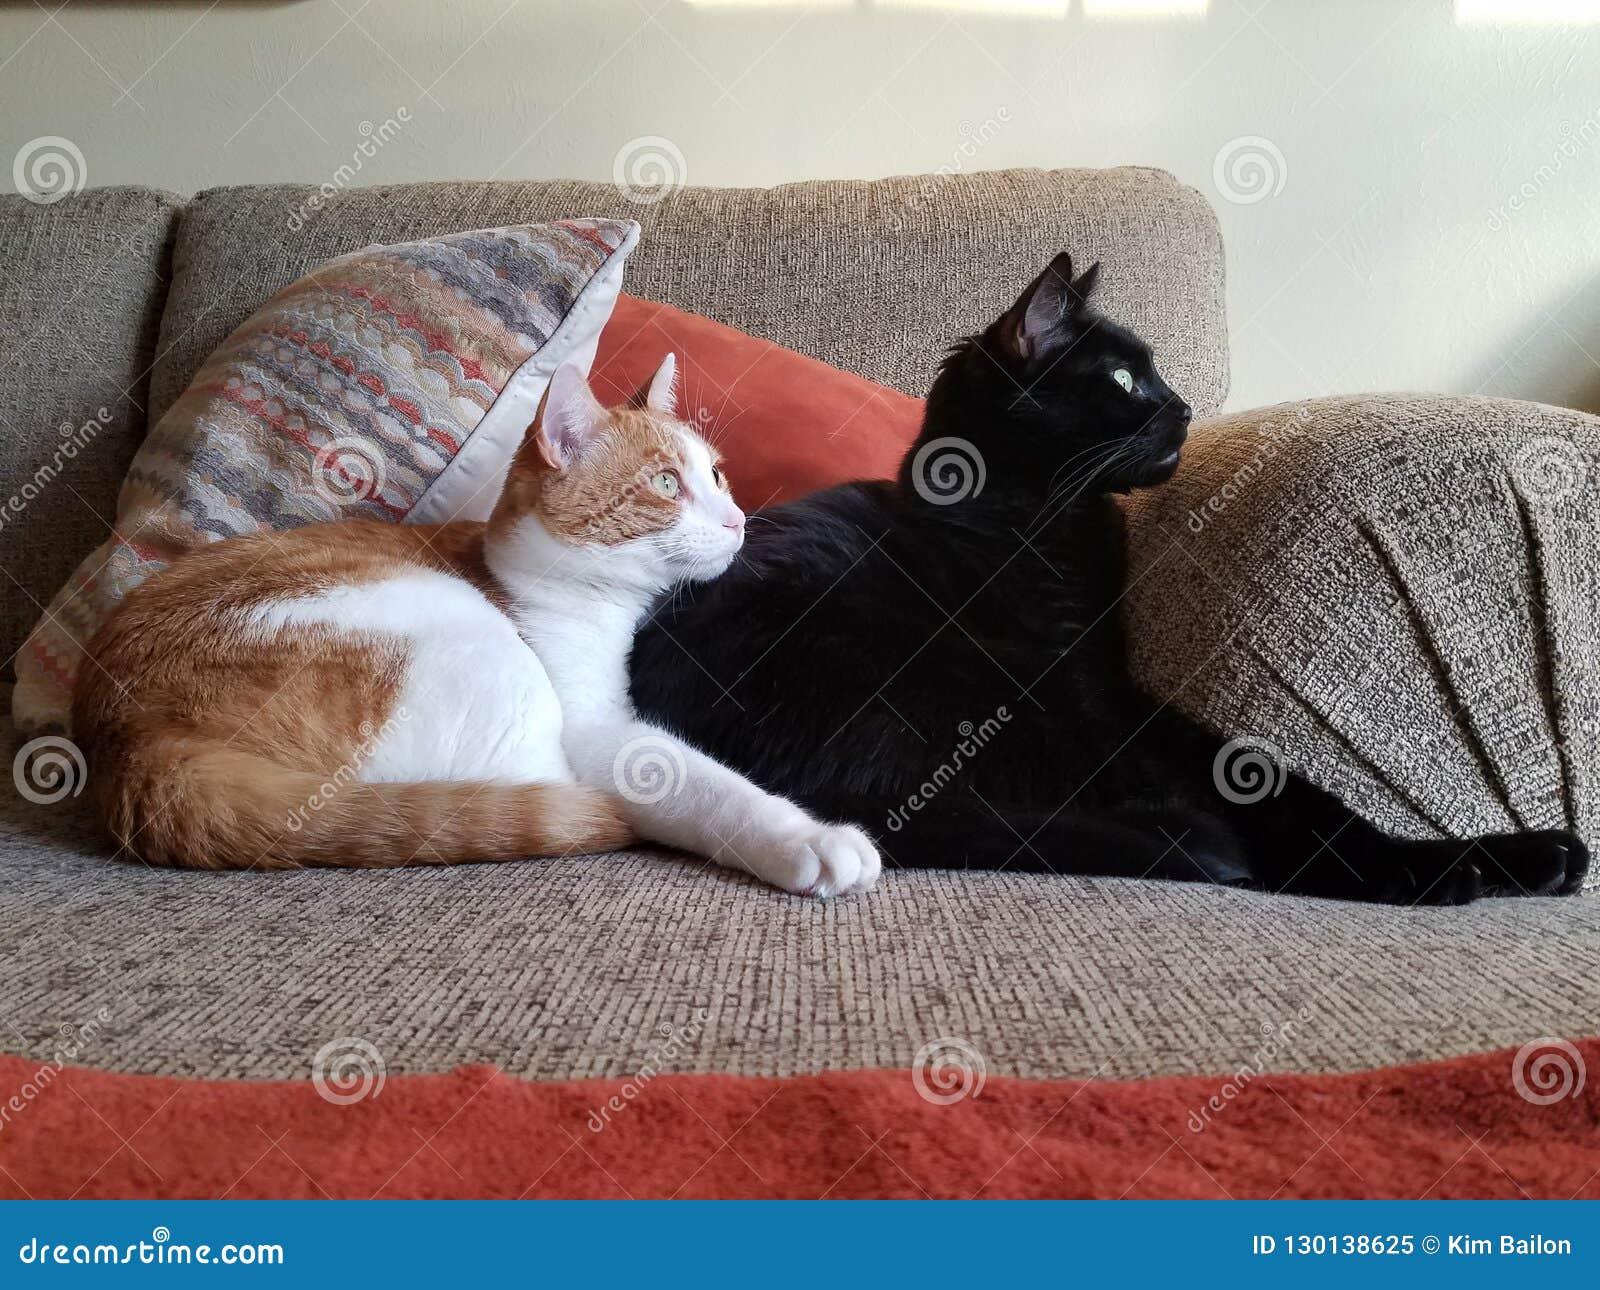 Cuddling Cats on sofa